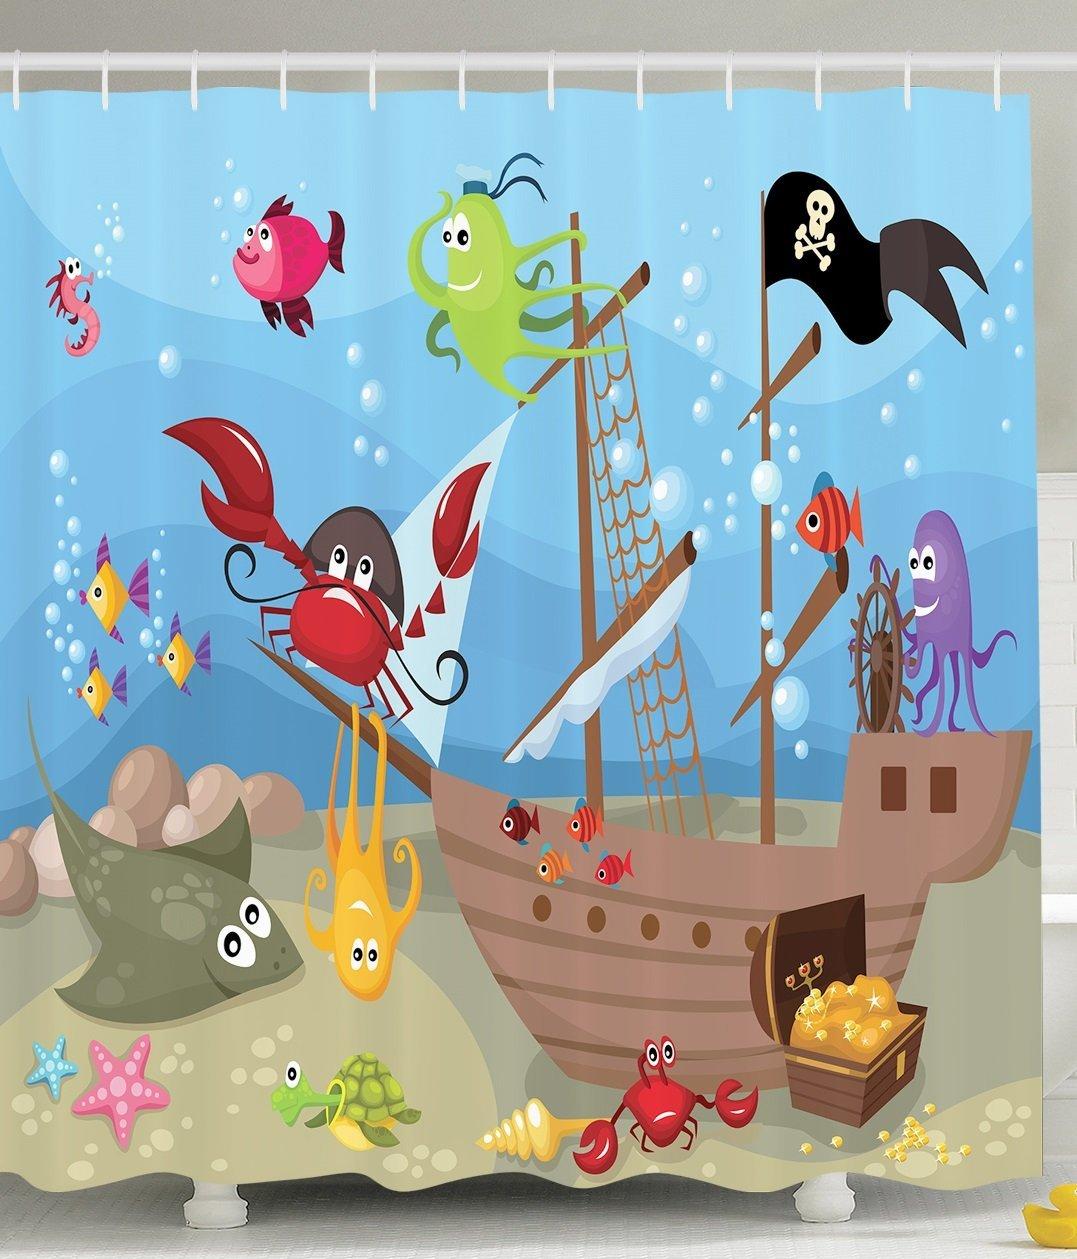 Ocean-Octopus-Treasure-Sunken-Ship-Pirate-Sail-Boat-Ahoy